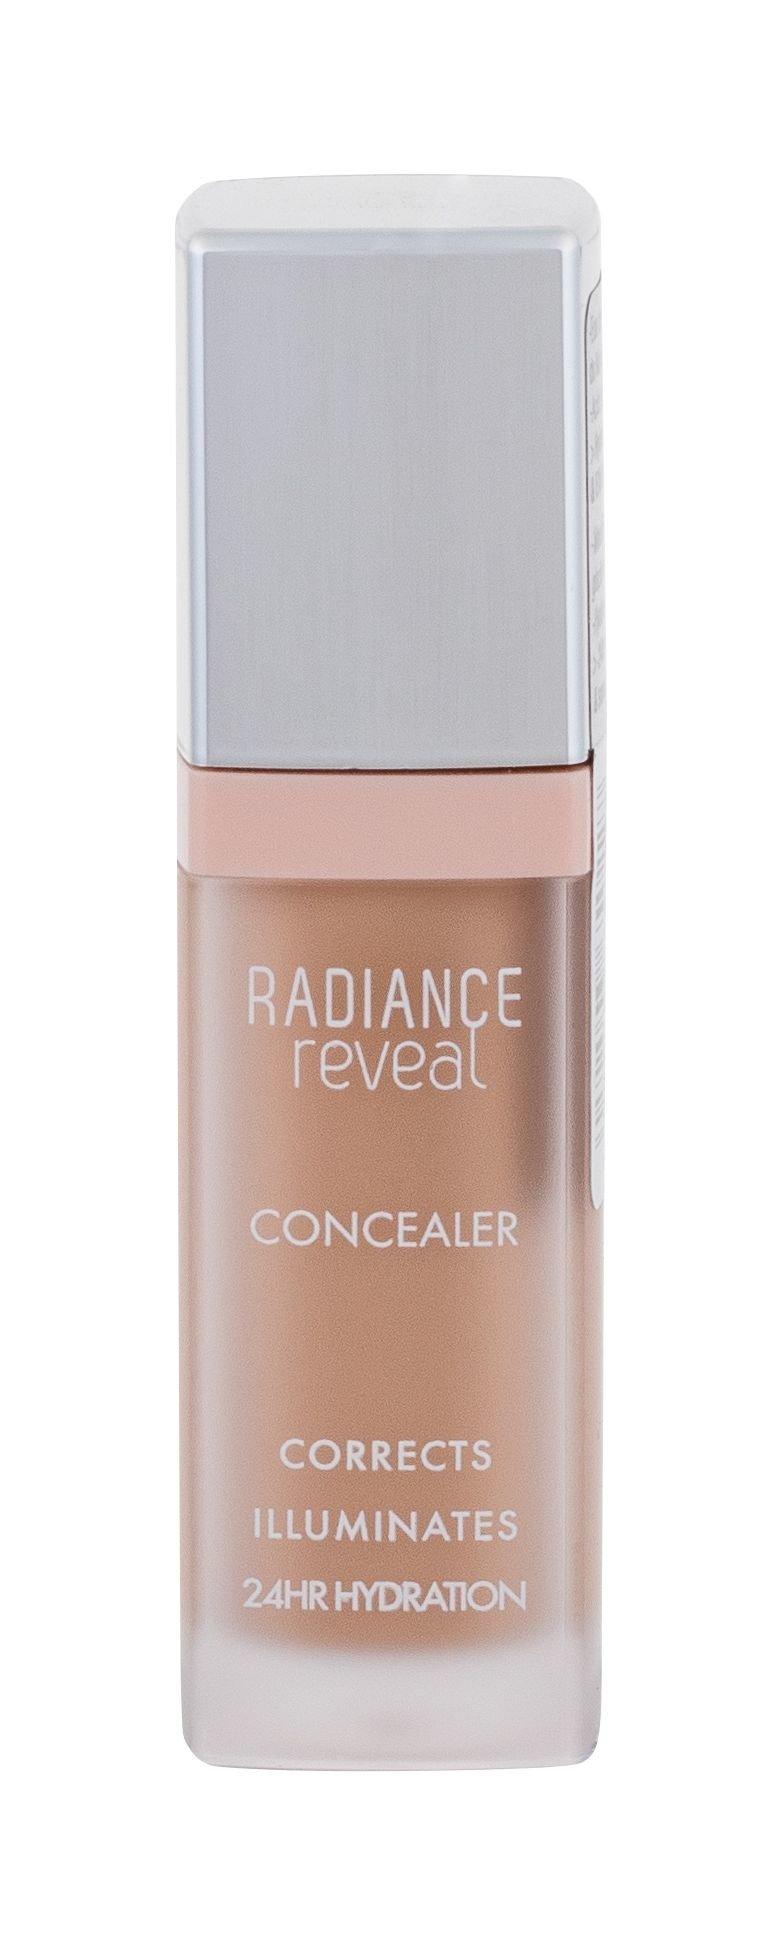 BOURJOIS Paris Radiance Reveal Cosmetic 7,8ml 02 Beige